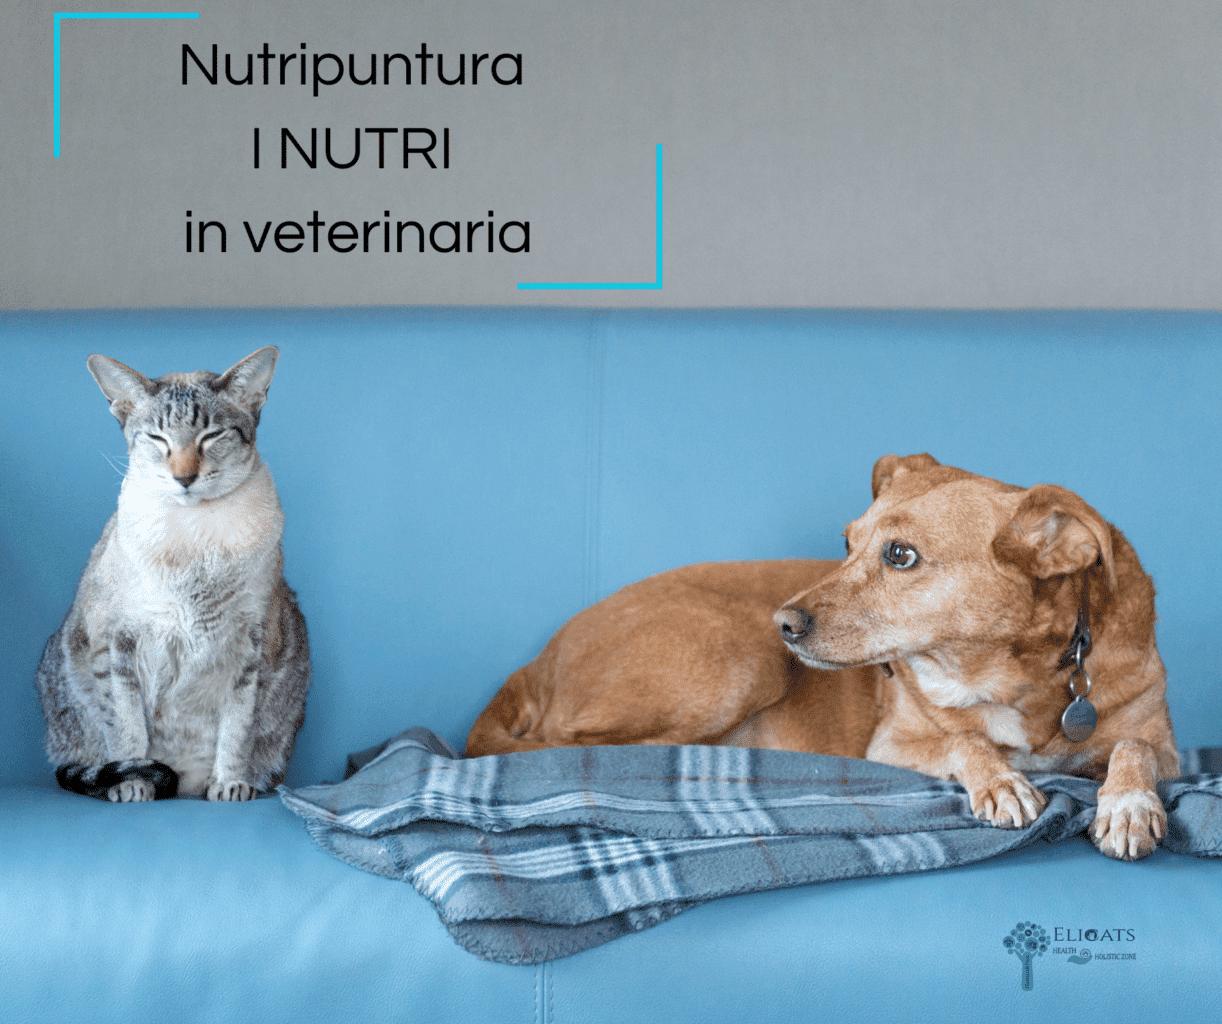 Nutripuntura gatto cane